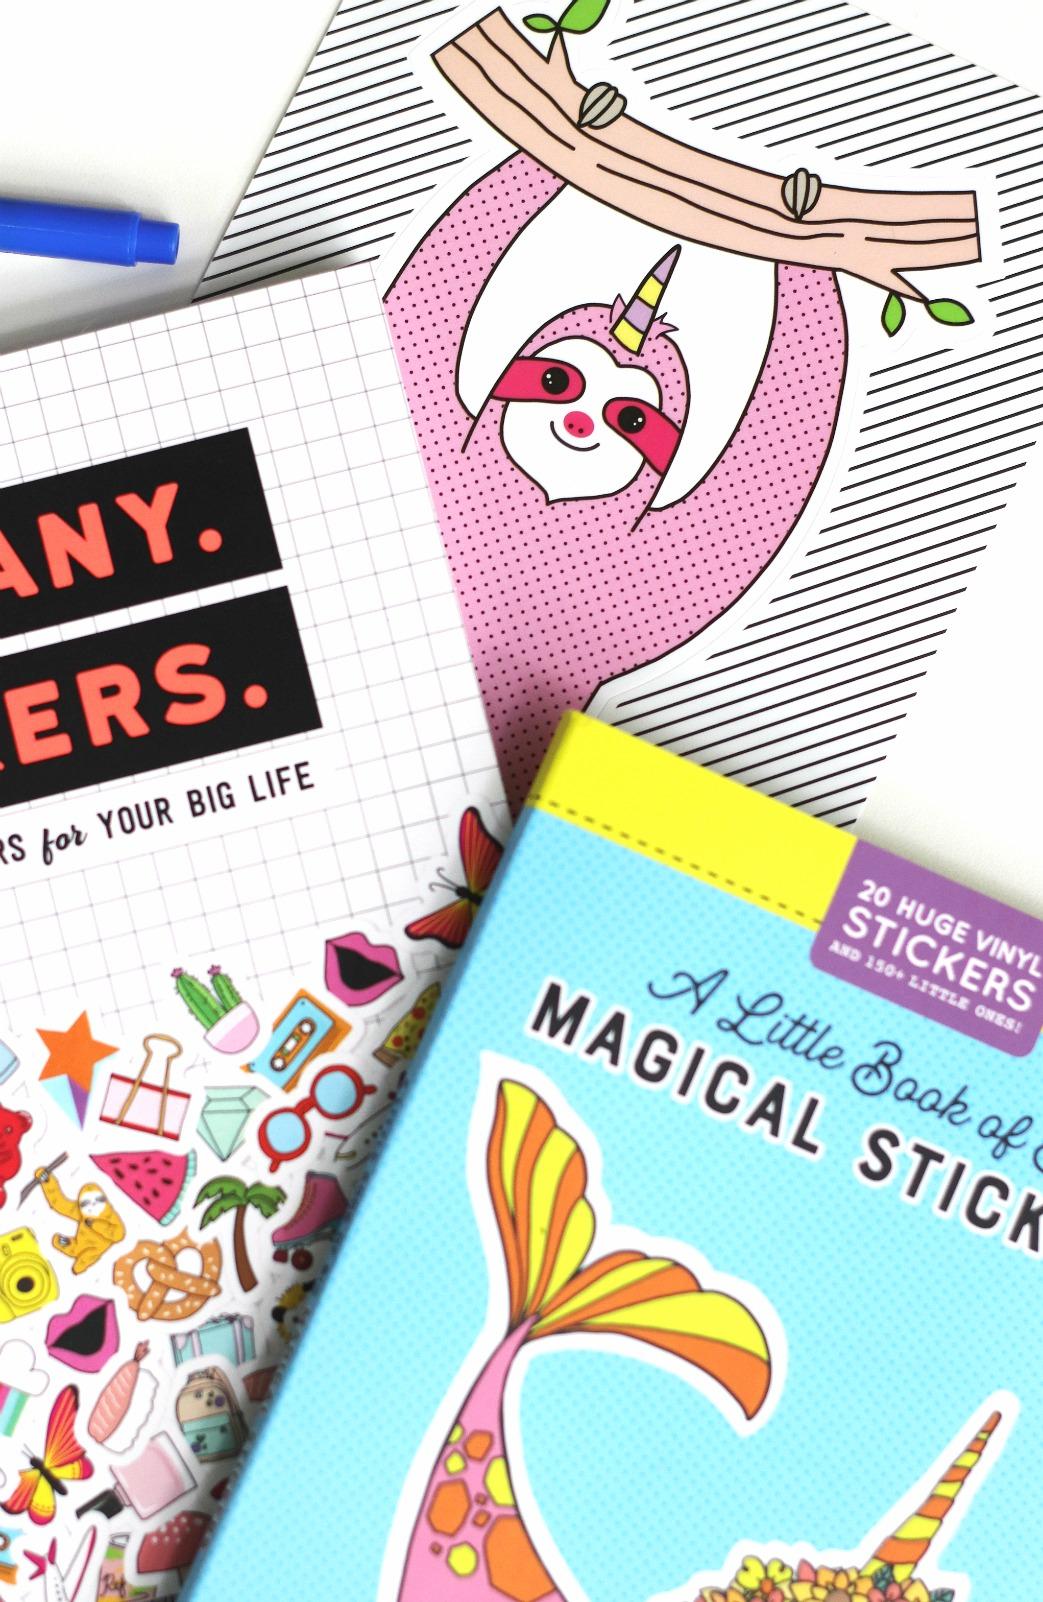 Pipsticks sloth sticker